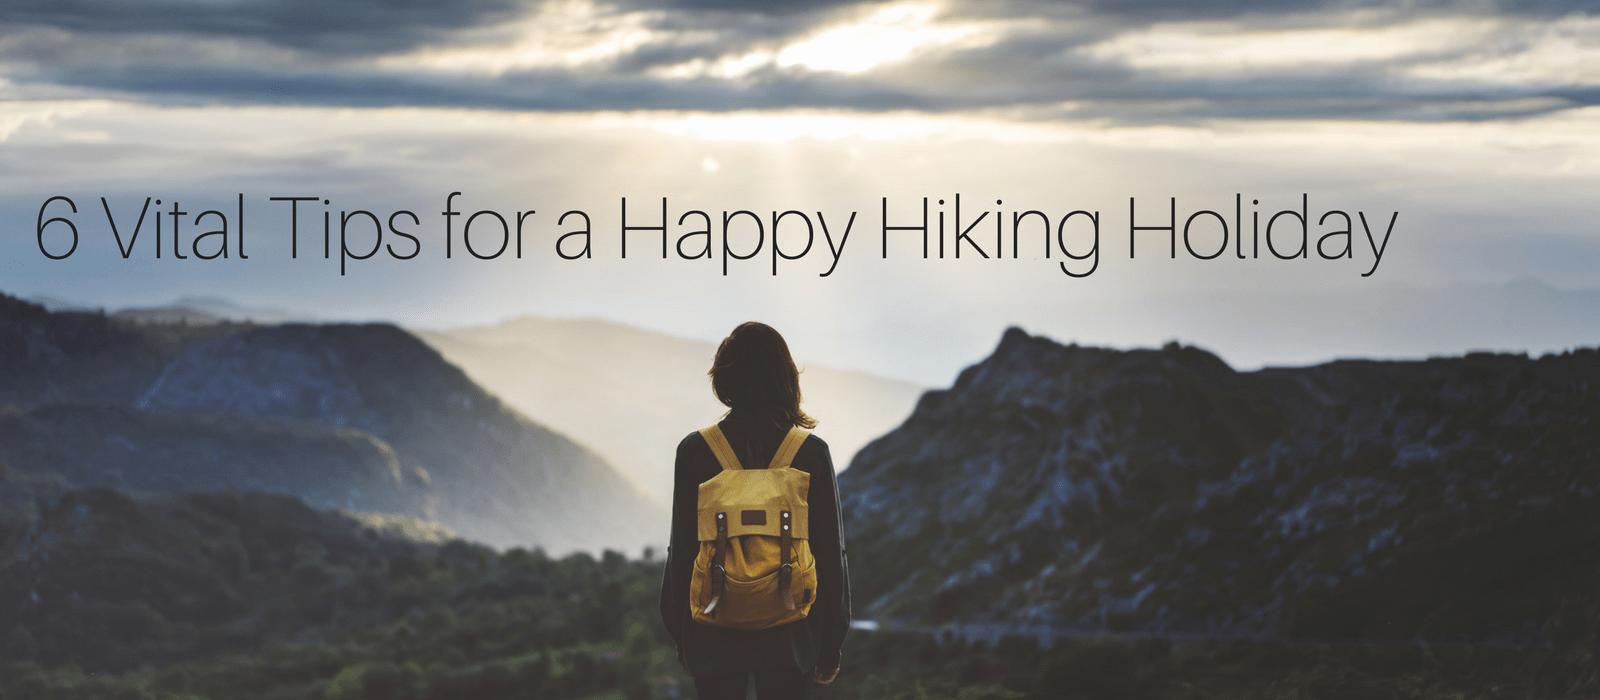 hiking holiday